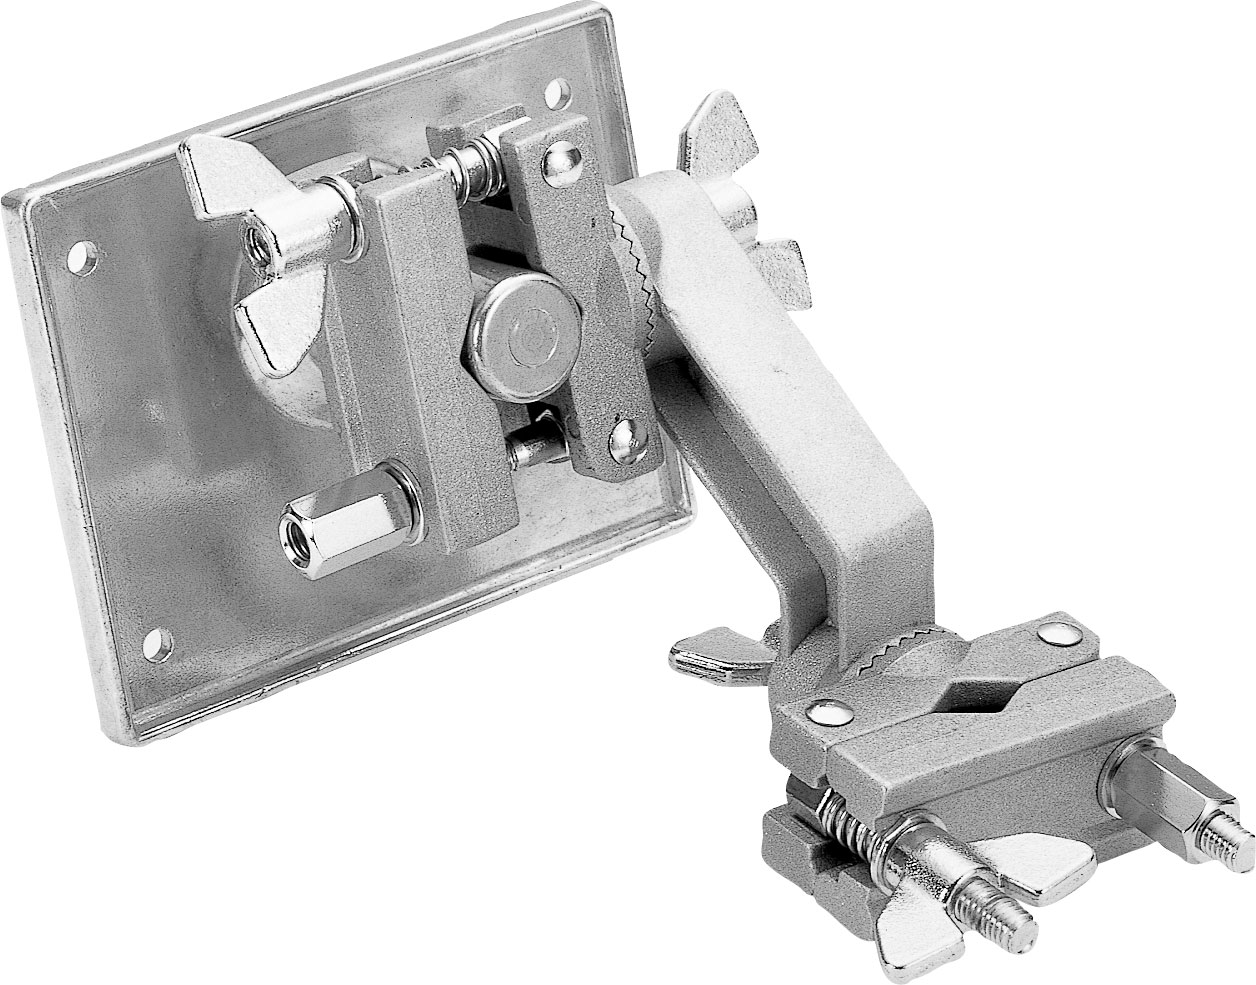 Roland APC-33 Mounting Clamp